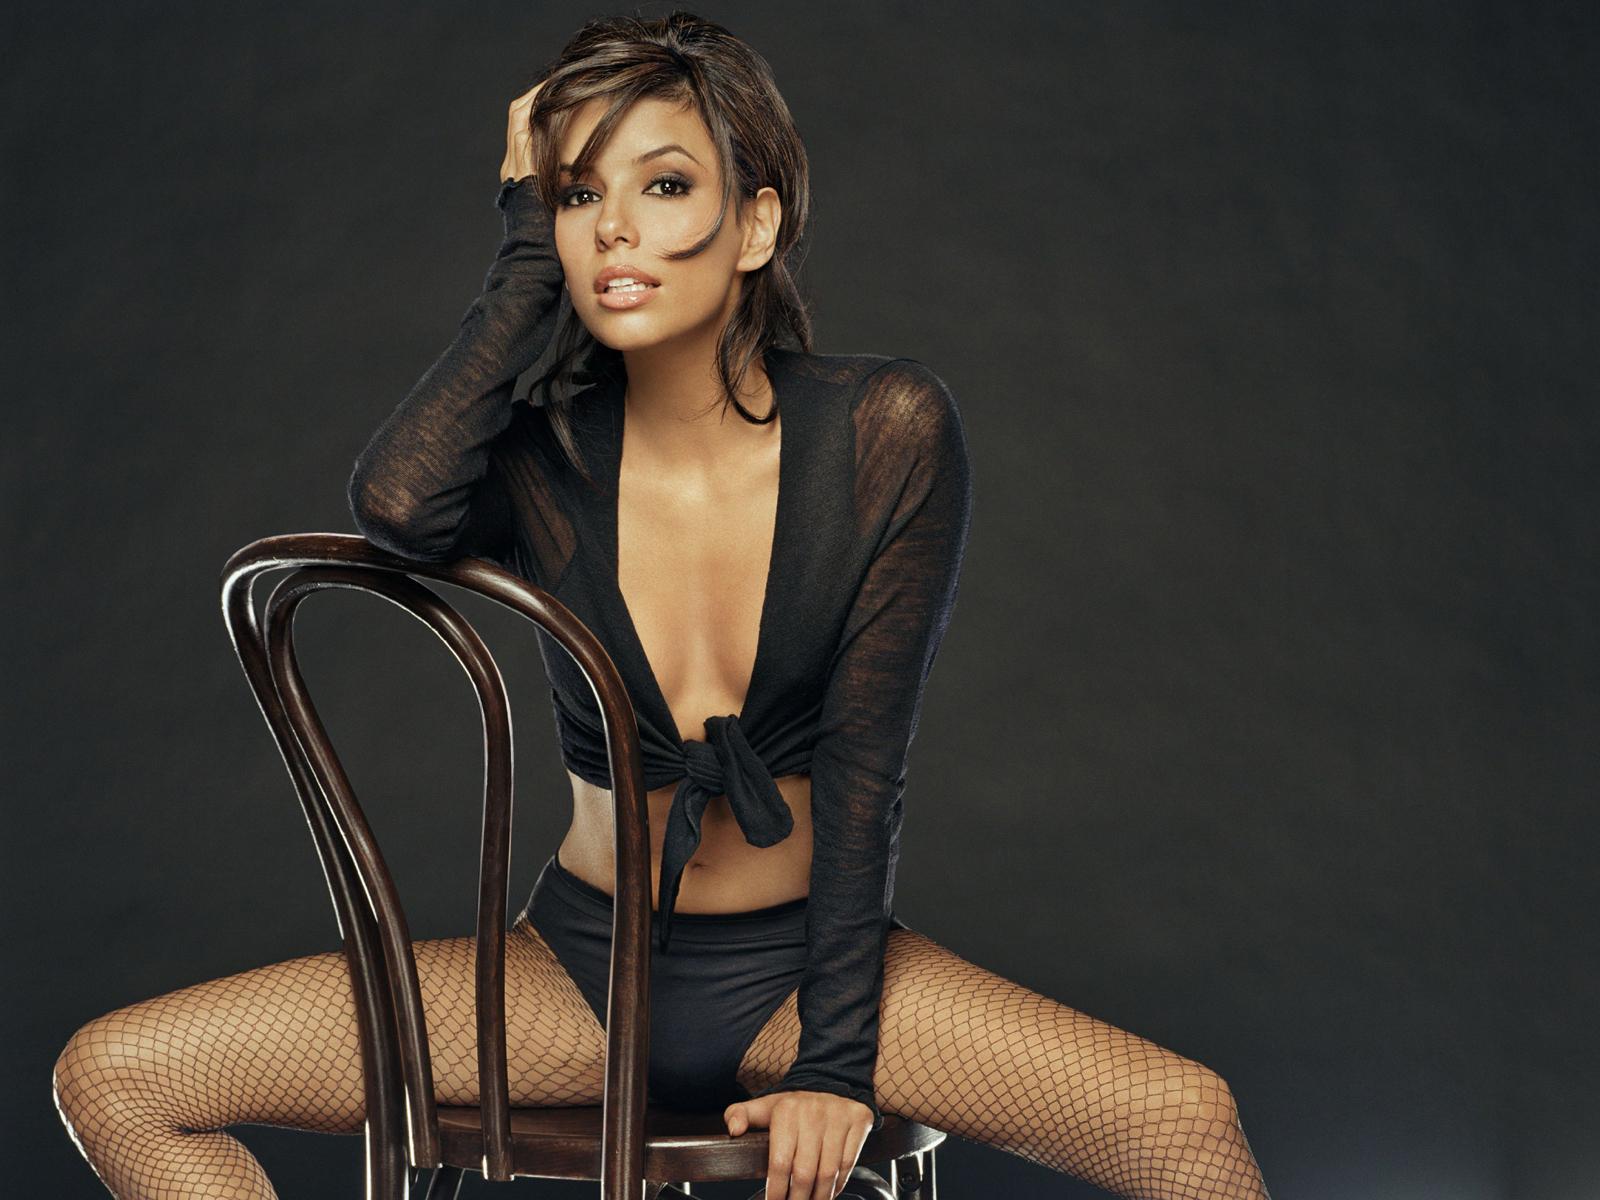 Eva longoria sexy photo shoot 3